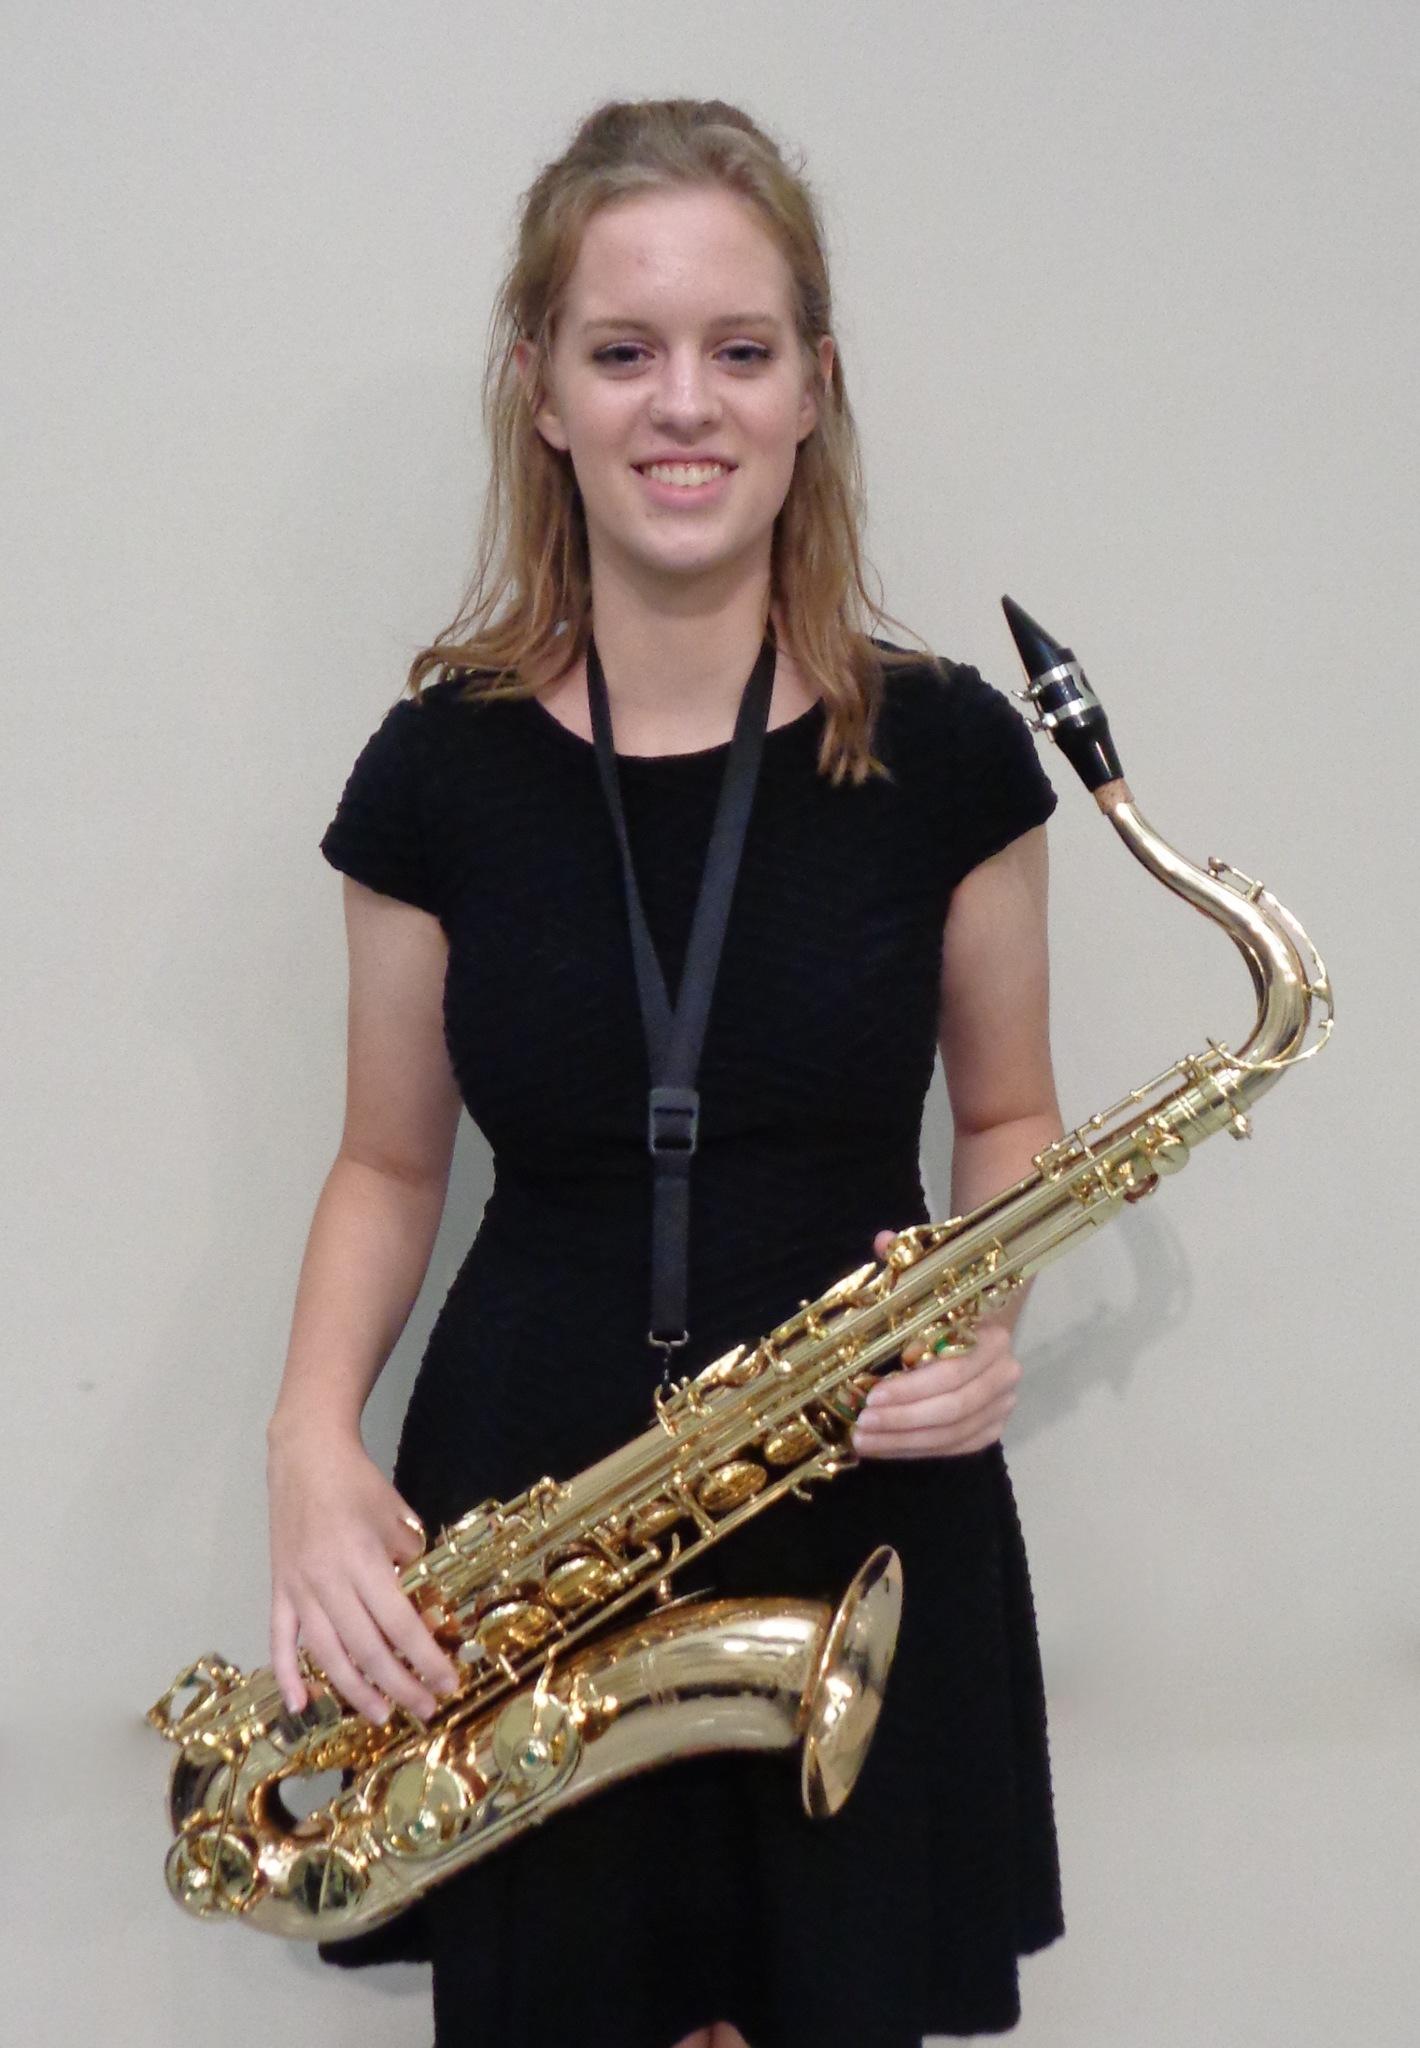 taiylor baumgardner, music education  chesapeake, va